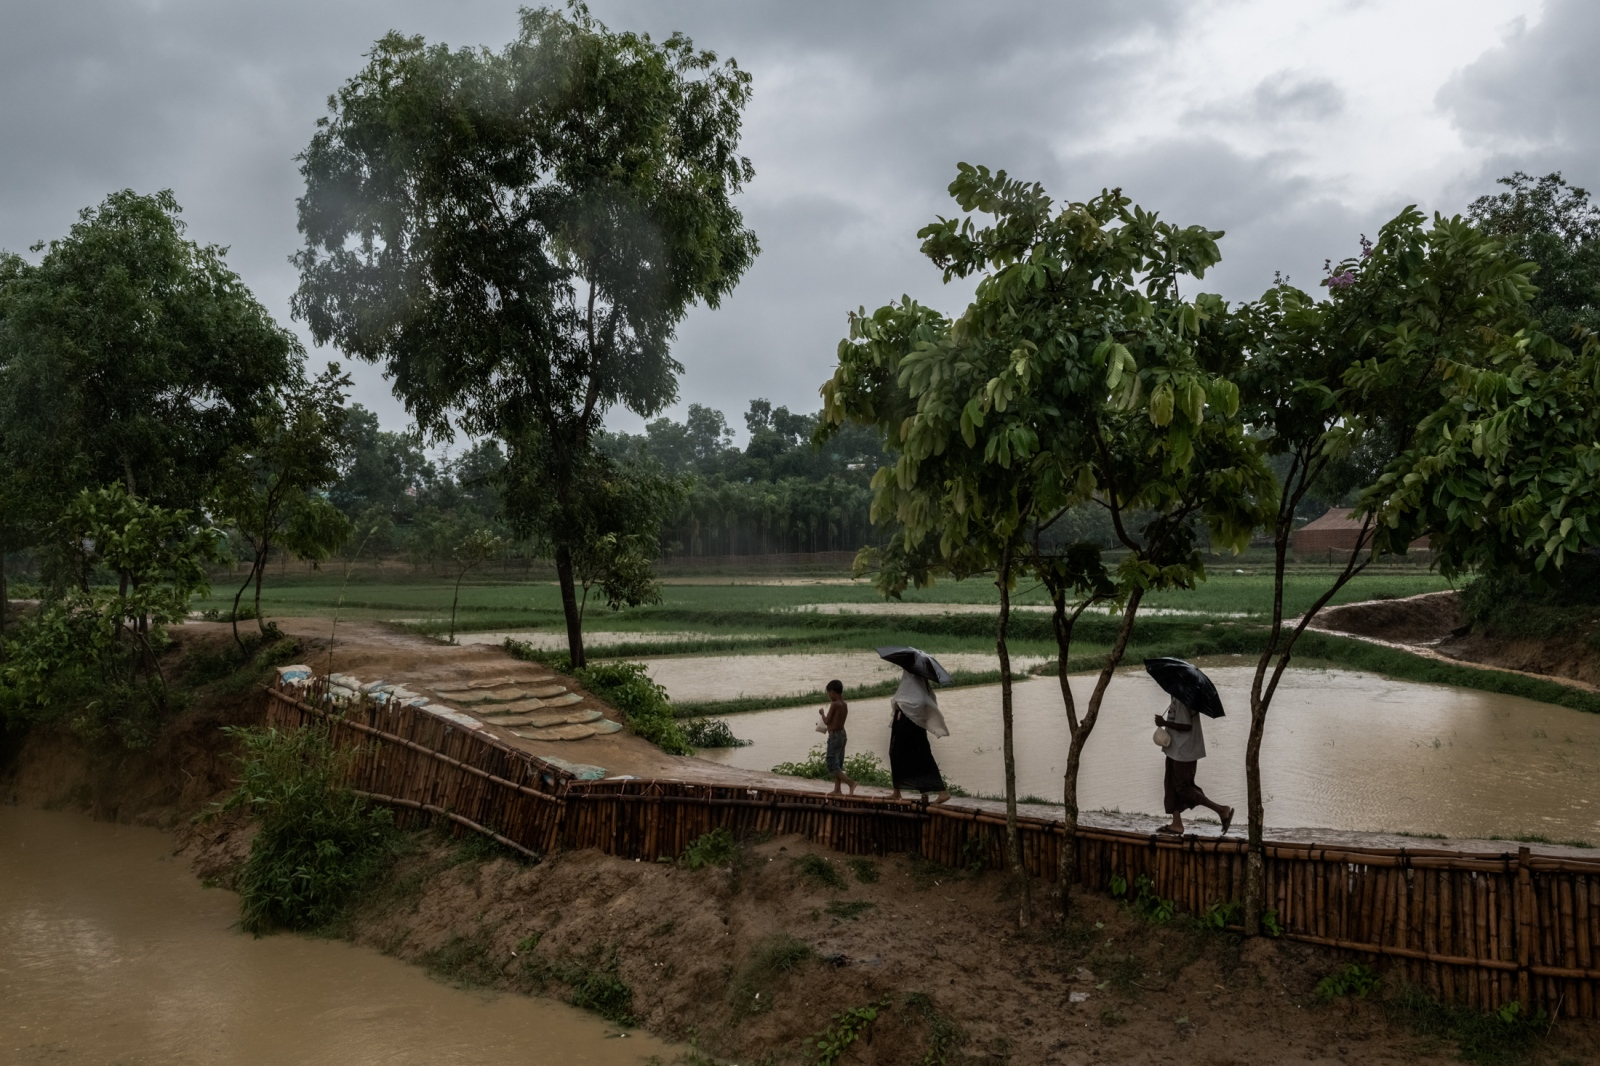 The Kutupalong refugee camp in Bangladesh